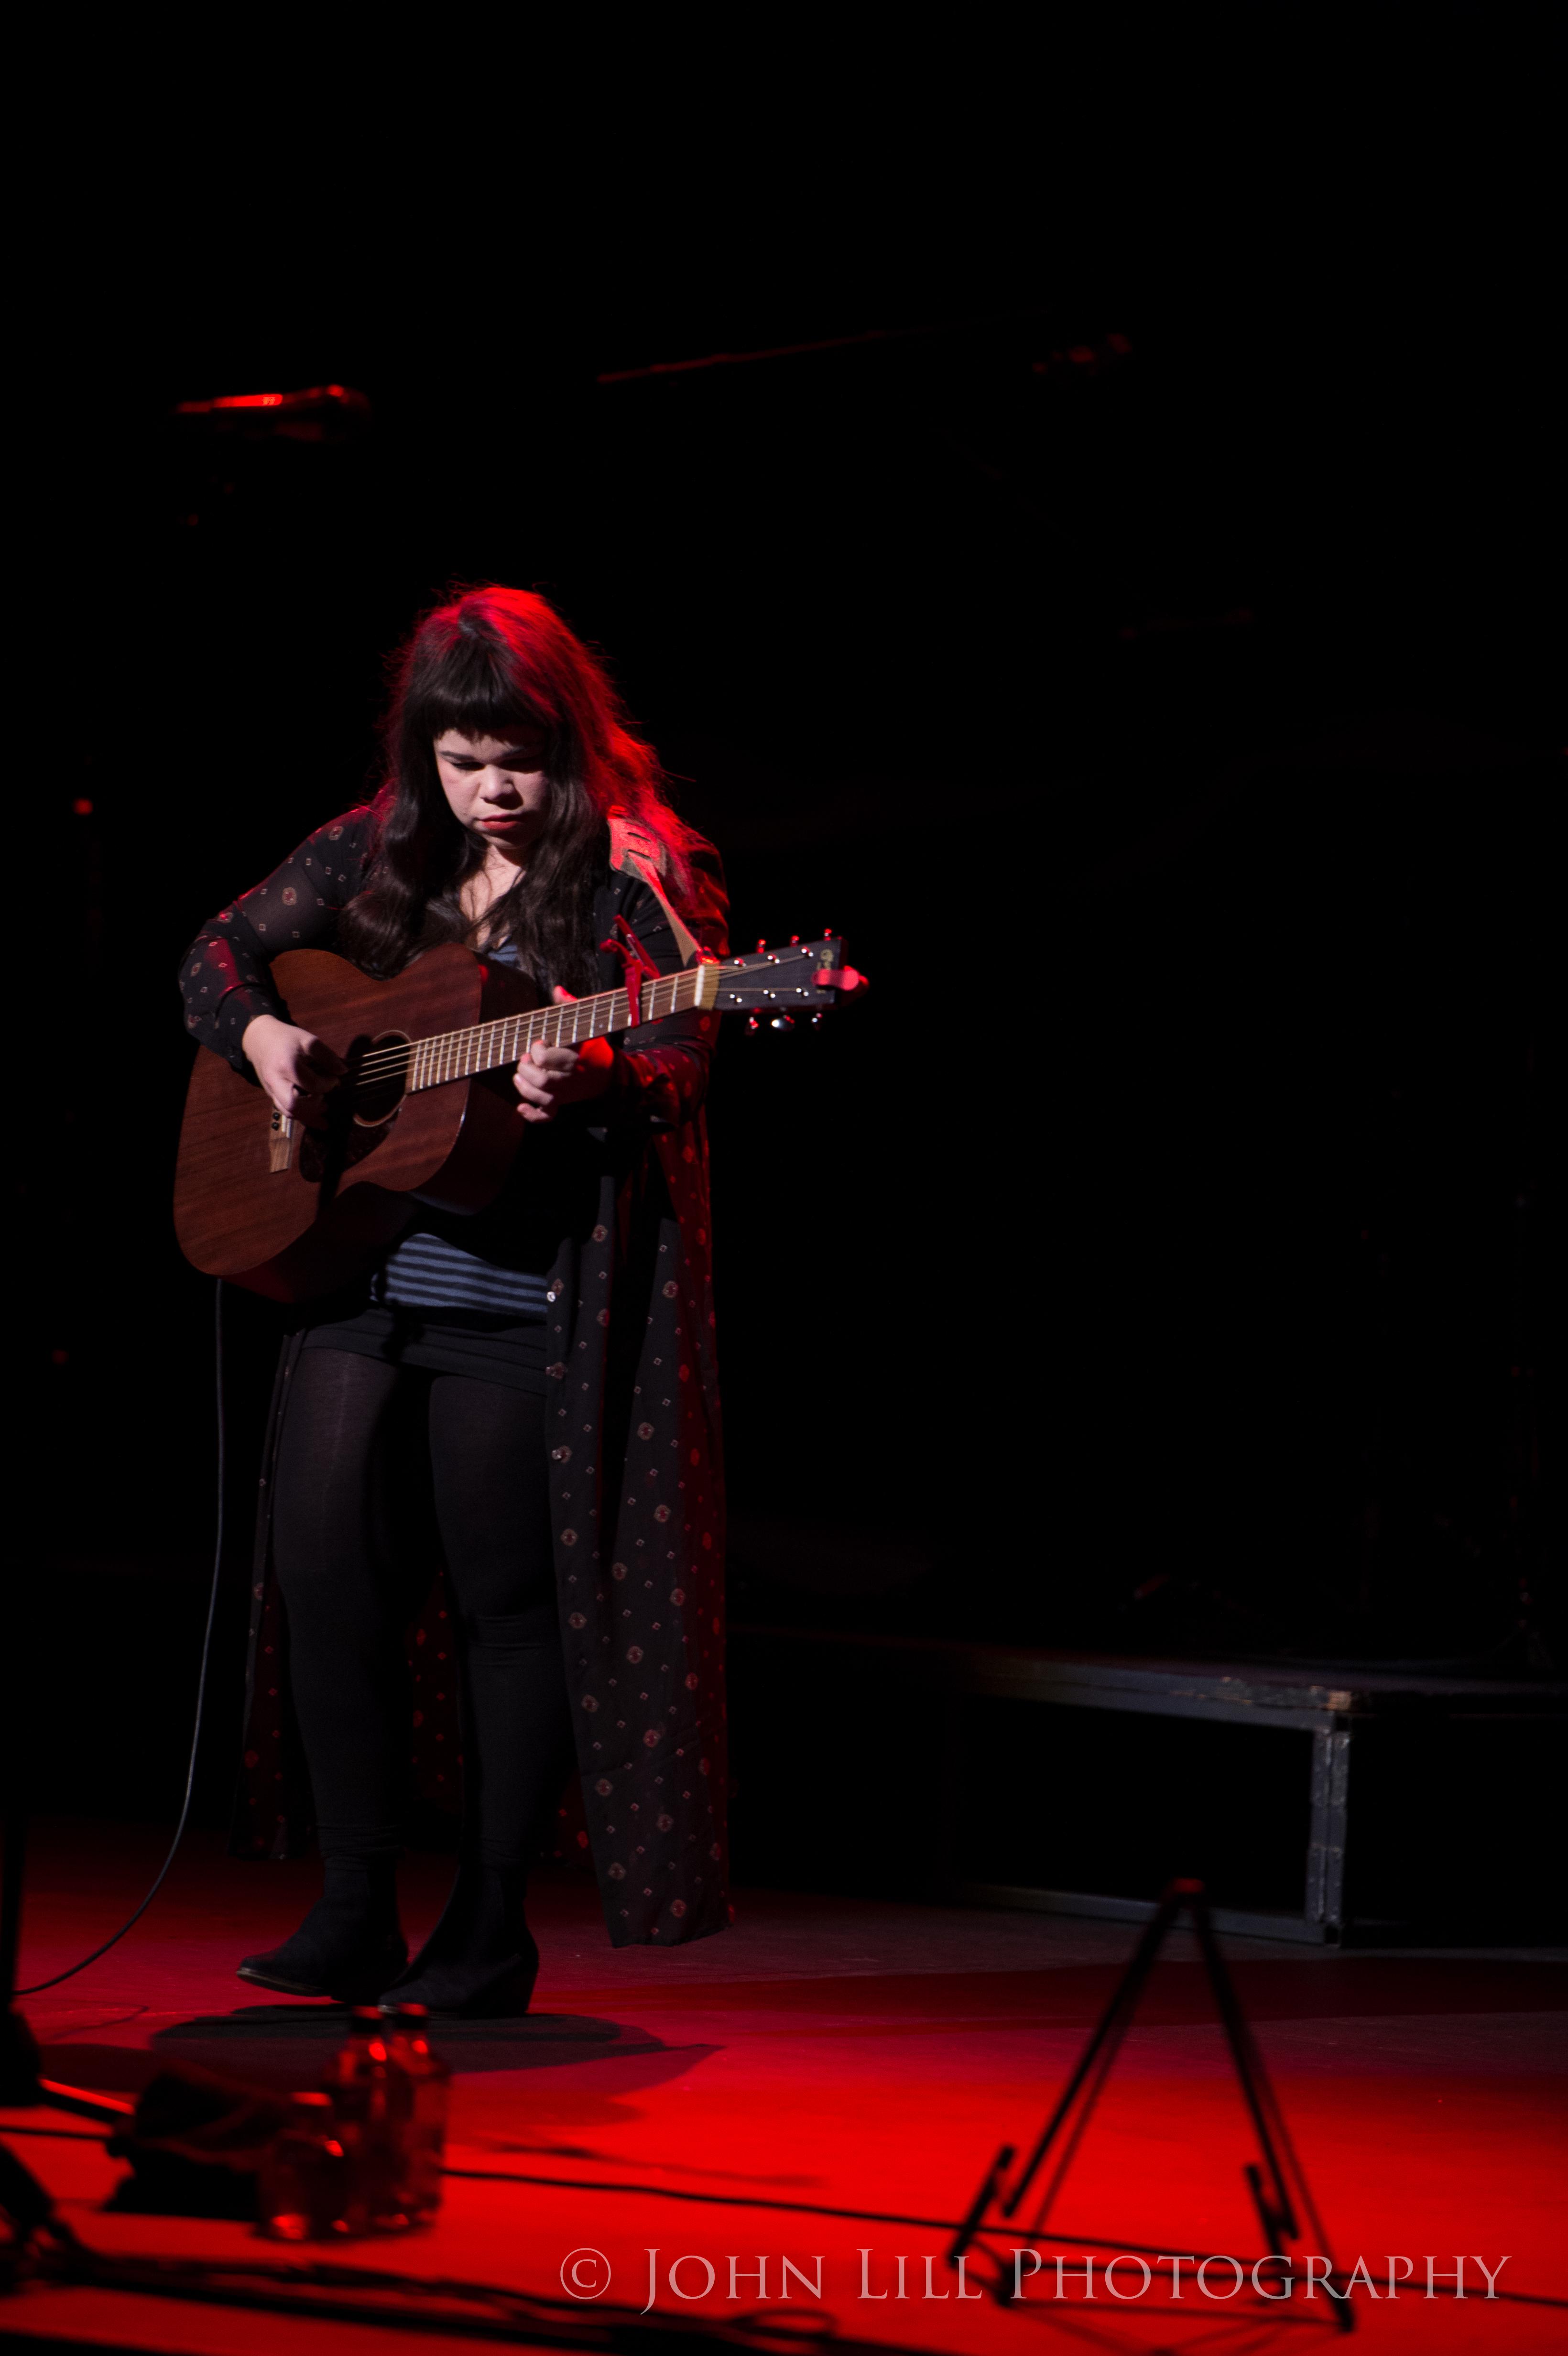 Samantha Crain at the Moore Theatre. Photo by John Lill